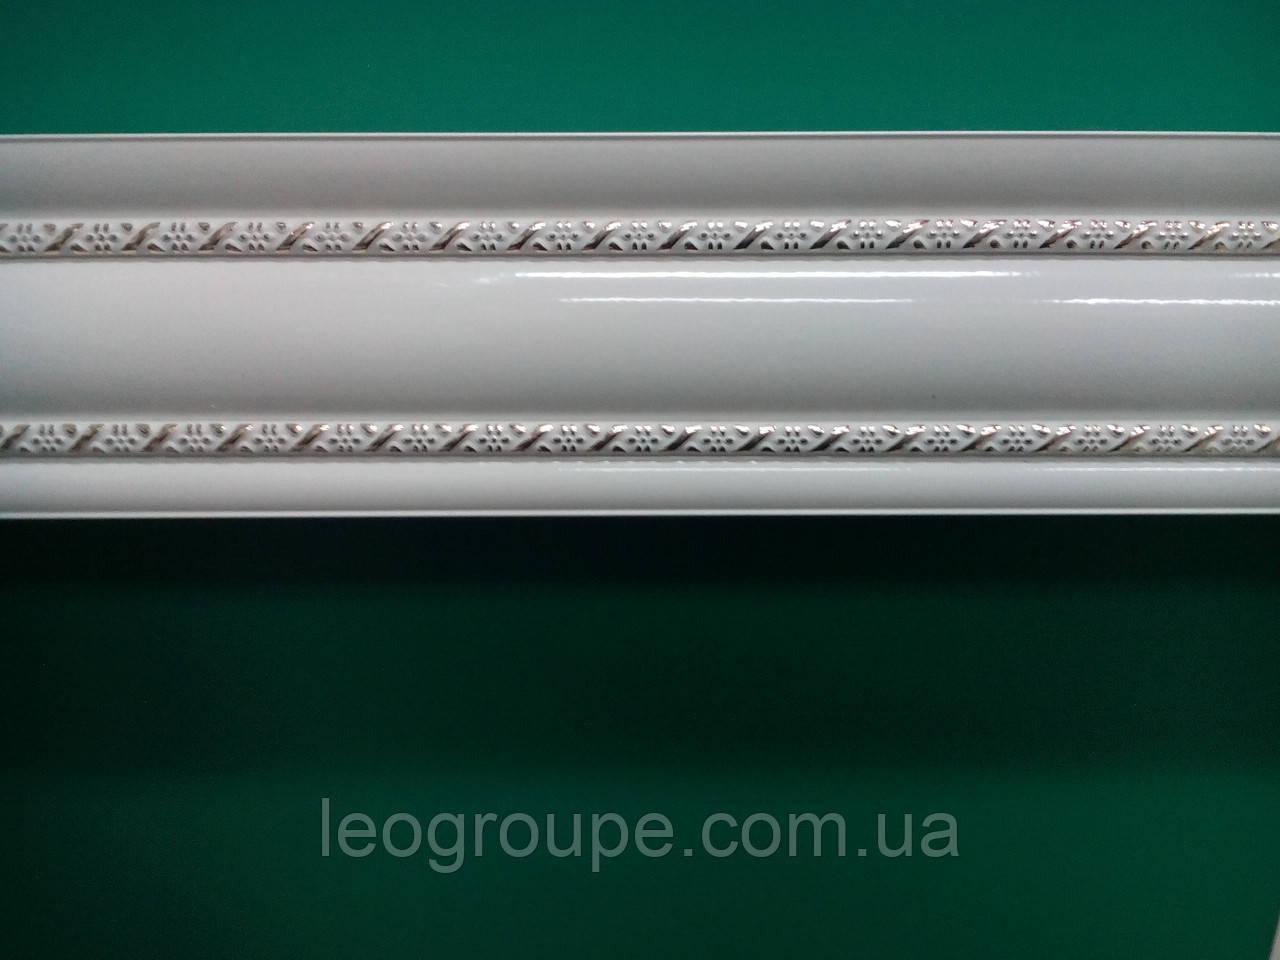 Карниз алюминий двойной  белый молдинг 2 -1,5м